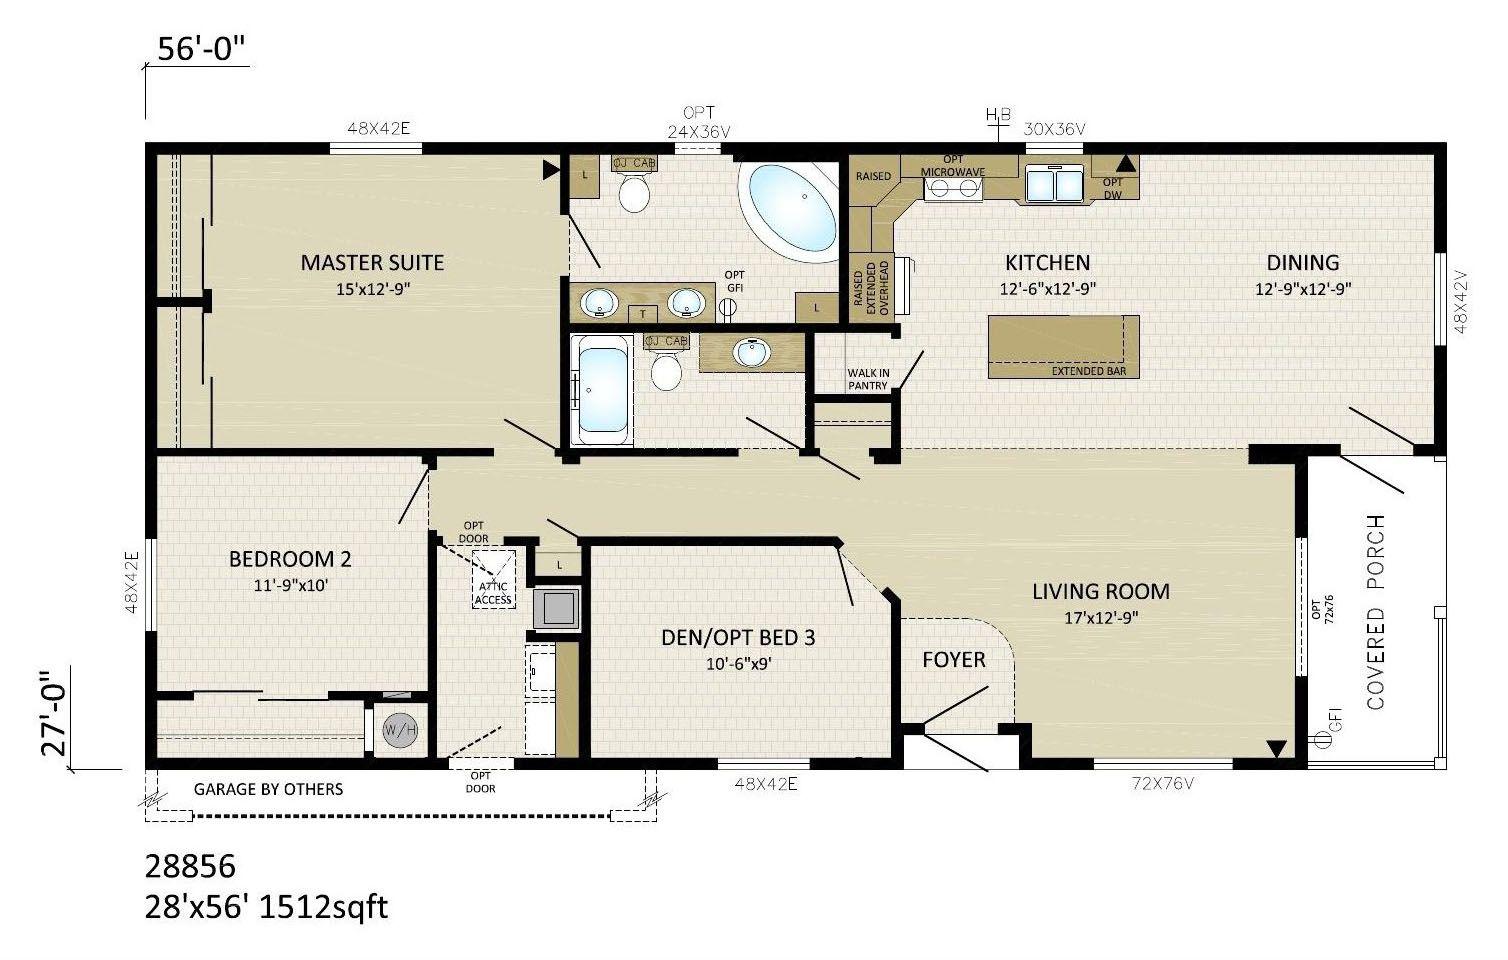 Modular Mansion Floor Plans: Mobile, Modular, Manufactured